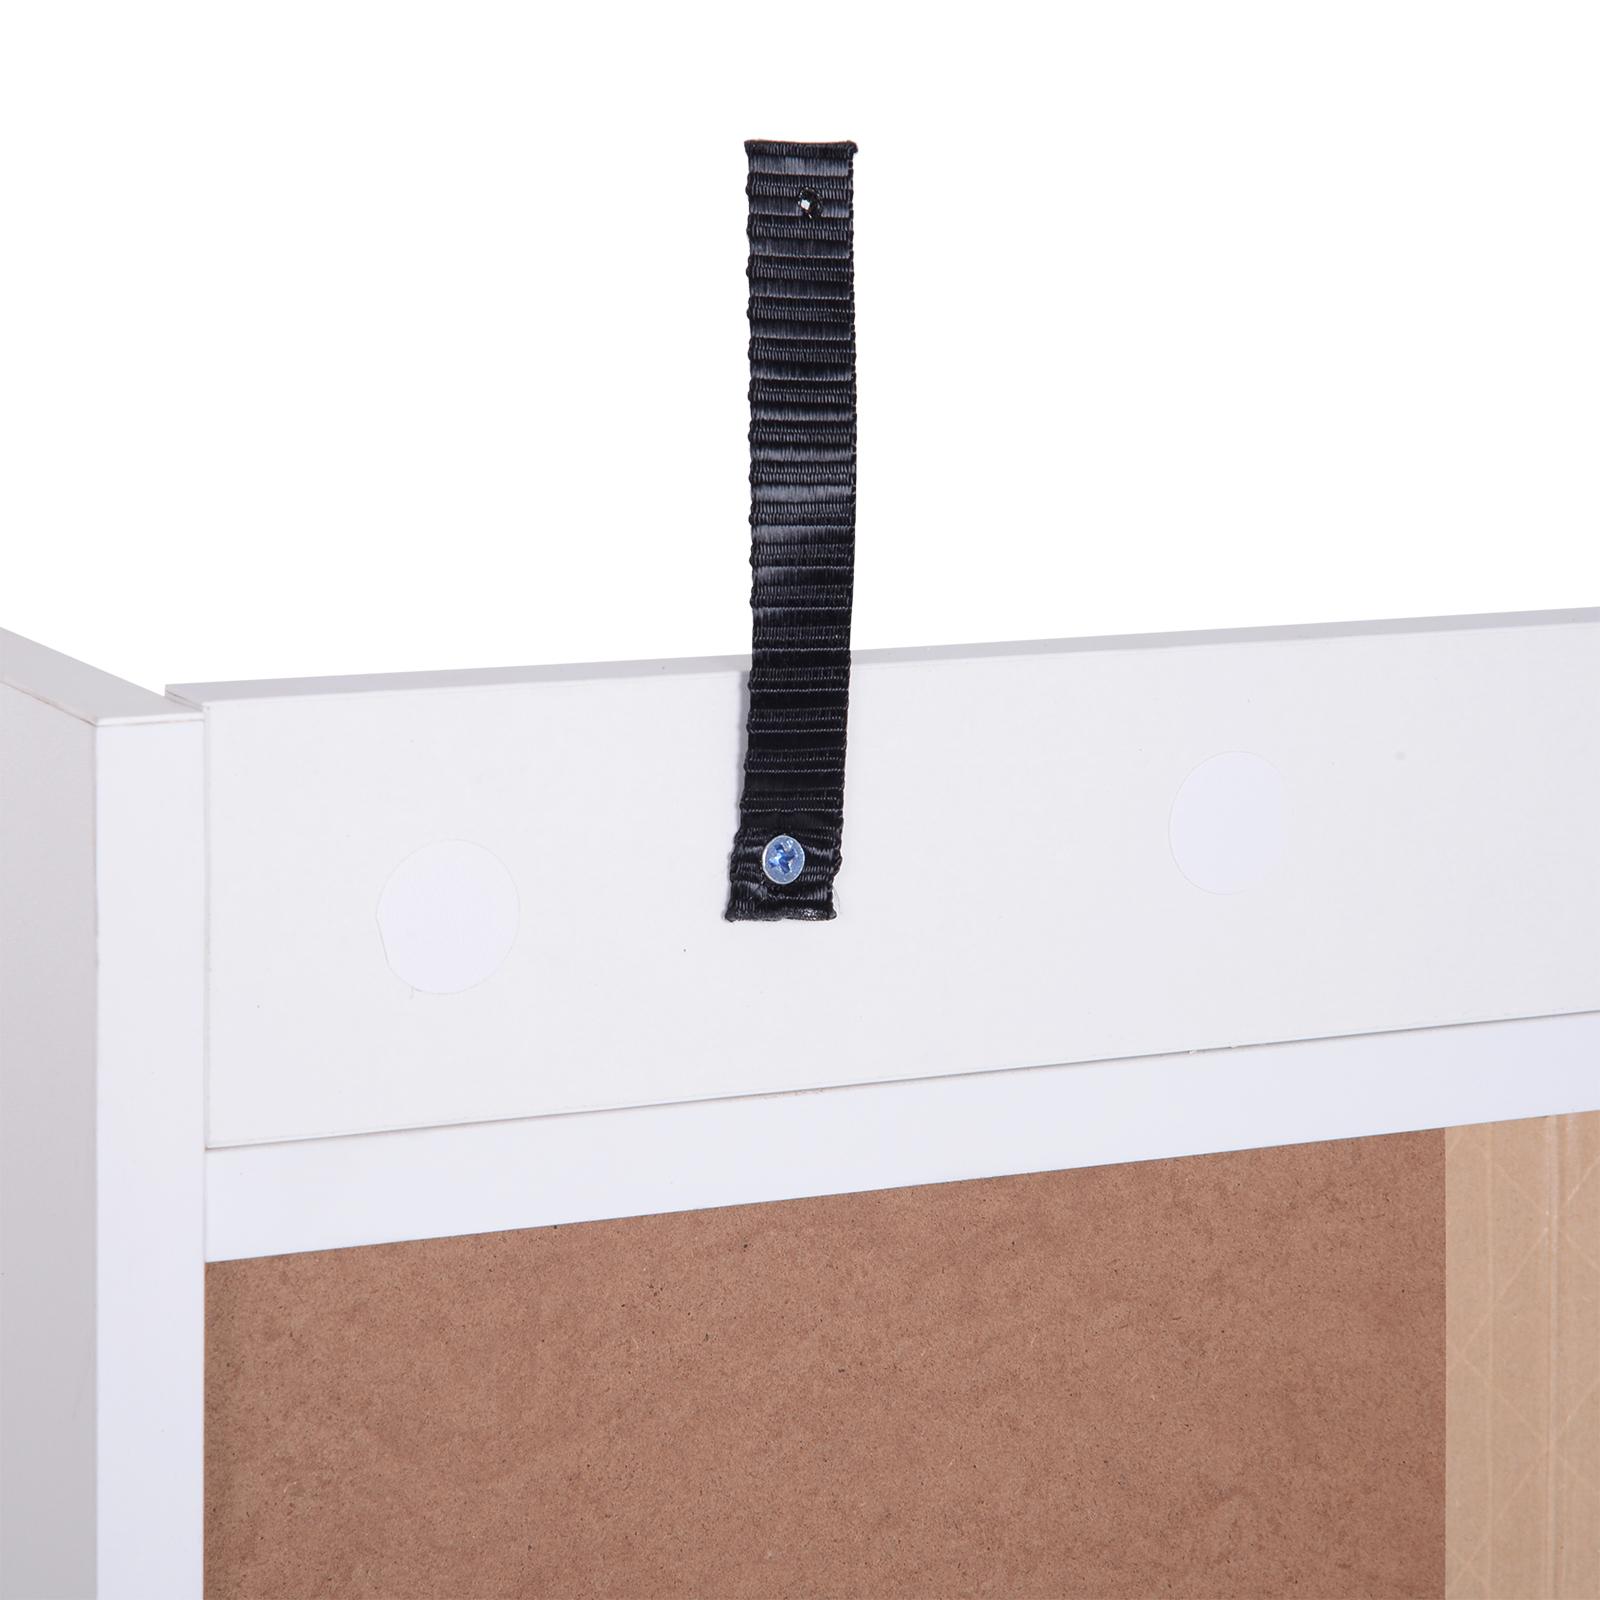 thumbnail 14 - Side-Cabinet-Hallway-Storage-Unit-Console-Table-Entrance-Shelf-Cupboard-2-color